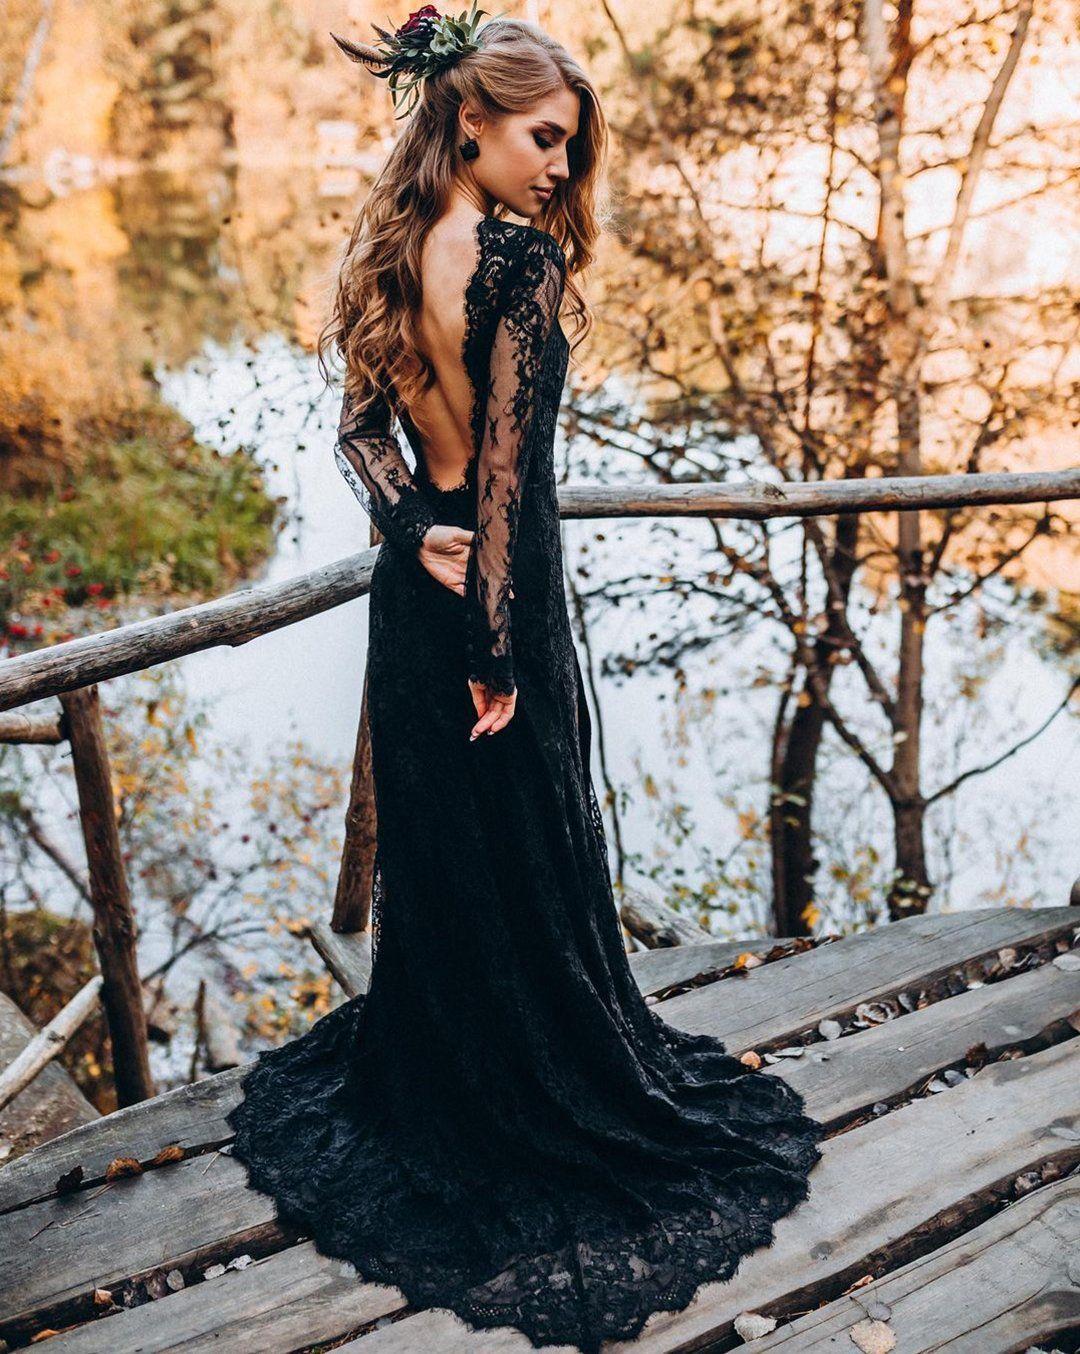 24 Black Wedding Dresses With Edgy Elegance Black Wedding Dresses Black Bridal Dresses Goth Wedding Dress Black [ 1354 x 1080 Pixel ]